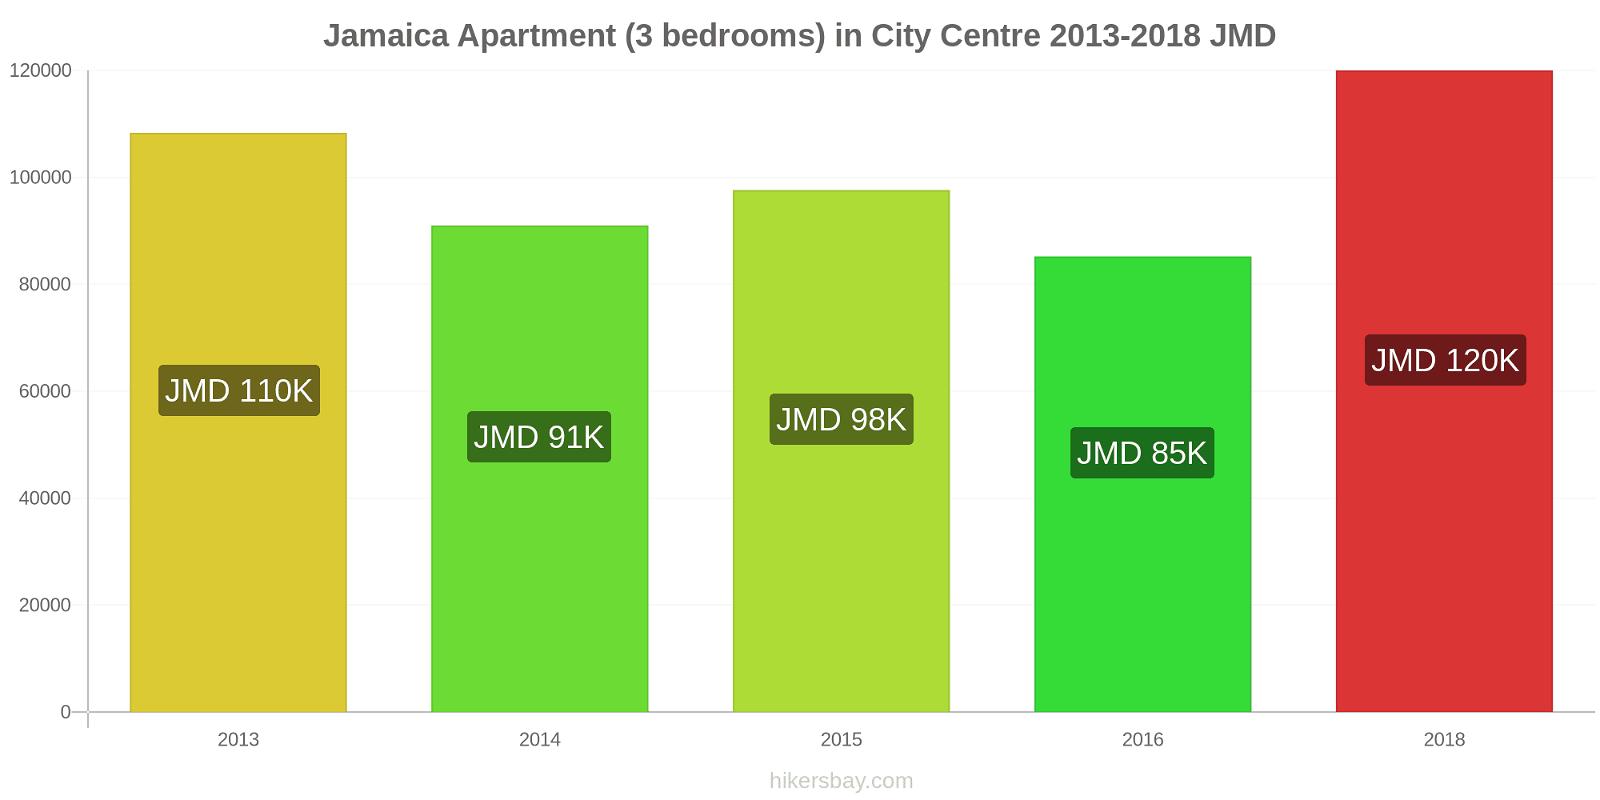 Jamaica price changes Apartment (3 bedrooms) in City Centre hikersbay.com